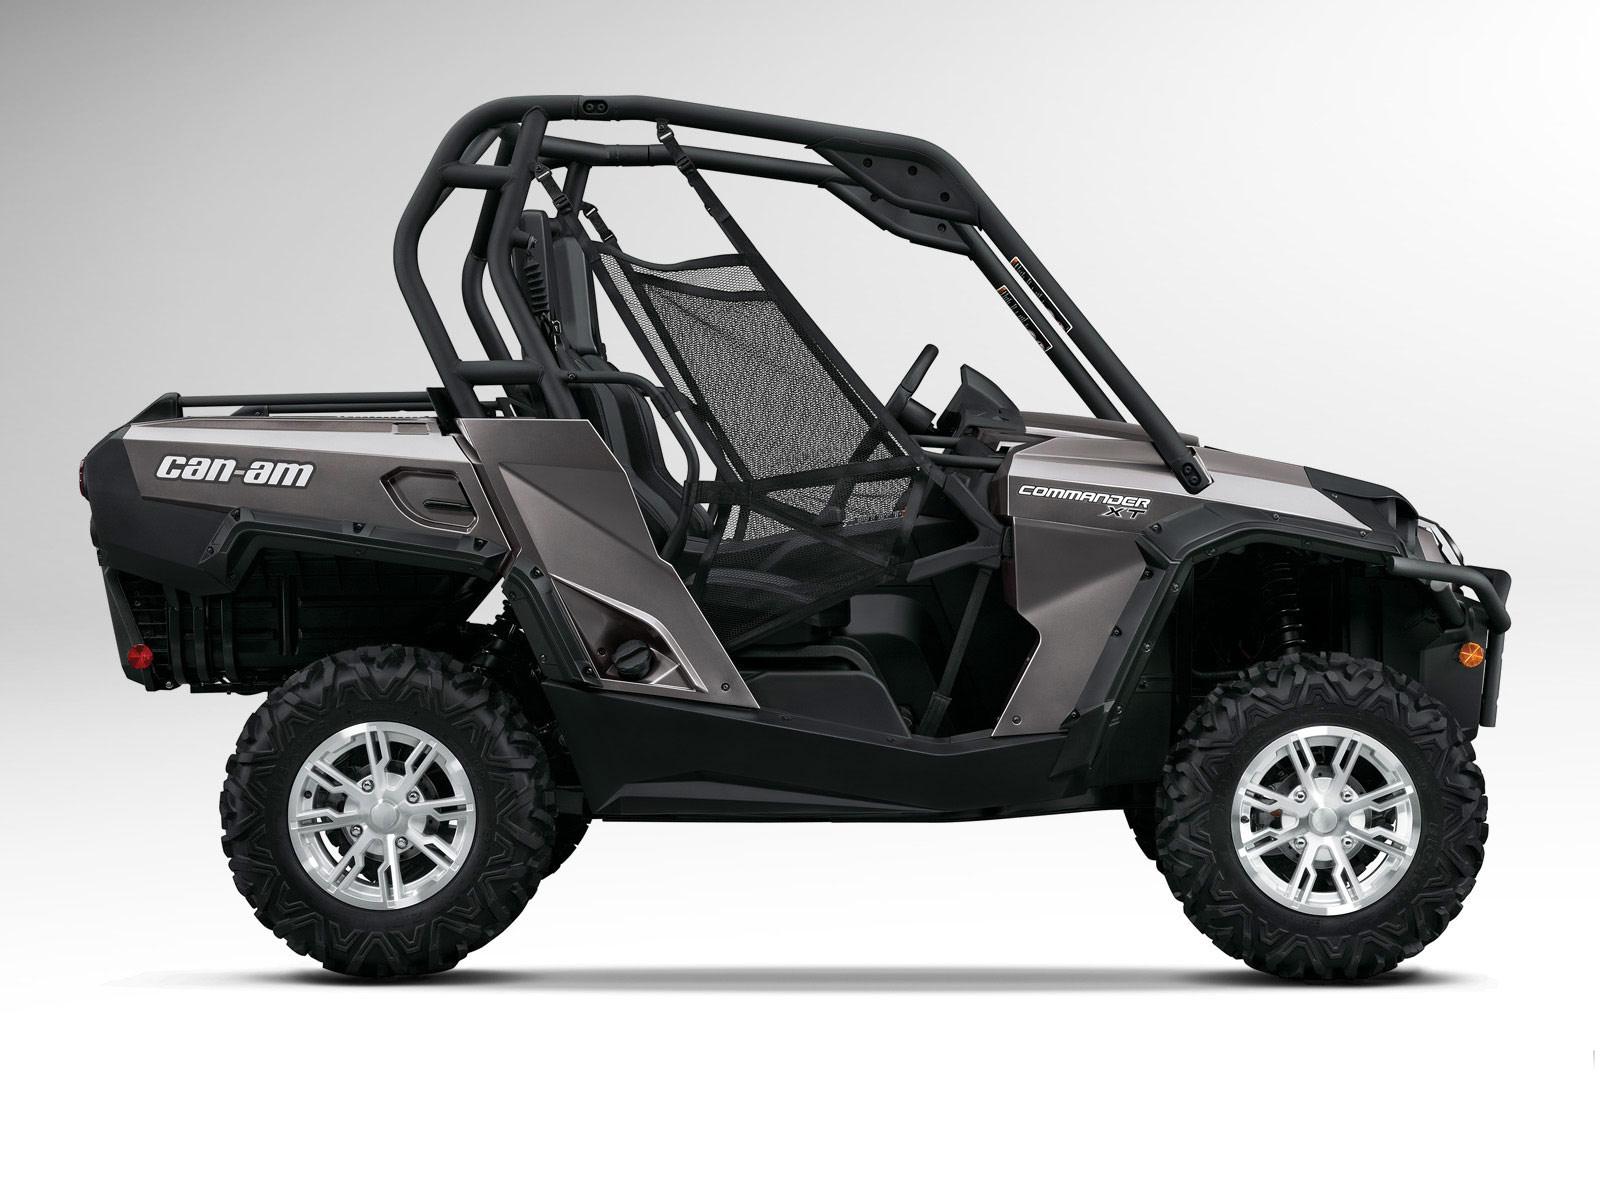 2012 can am commander 1000 xt auto insurance information. Black Bedroom Furniture Sets. Home Design Ideas